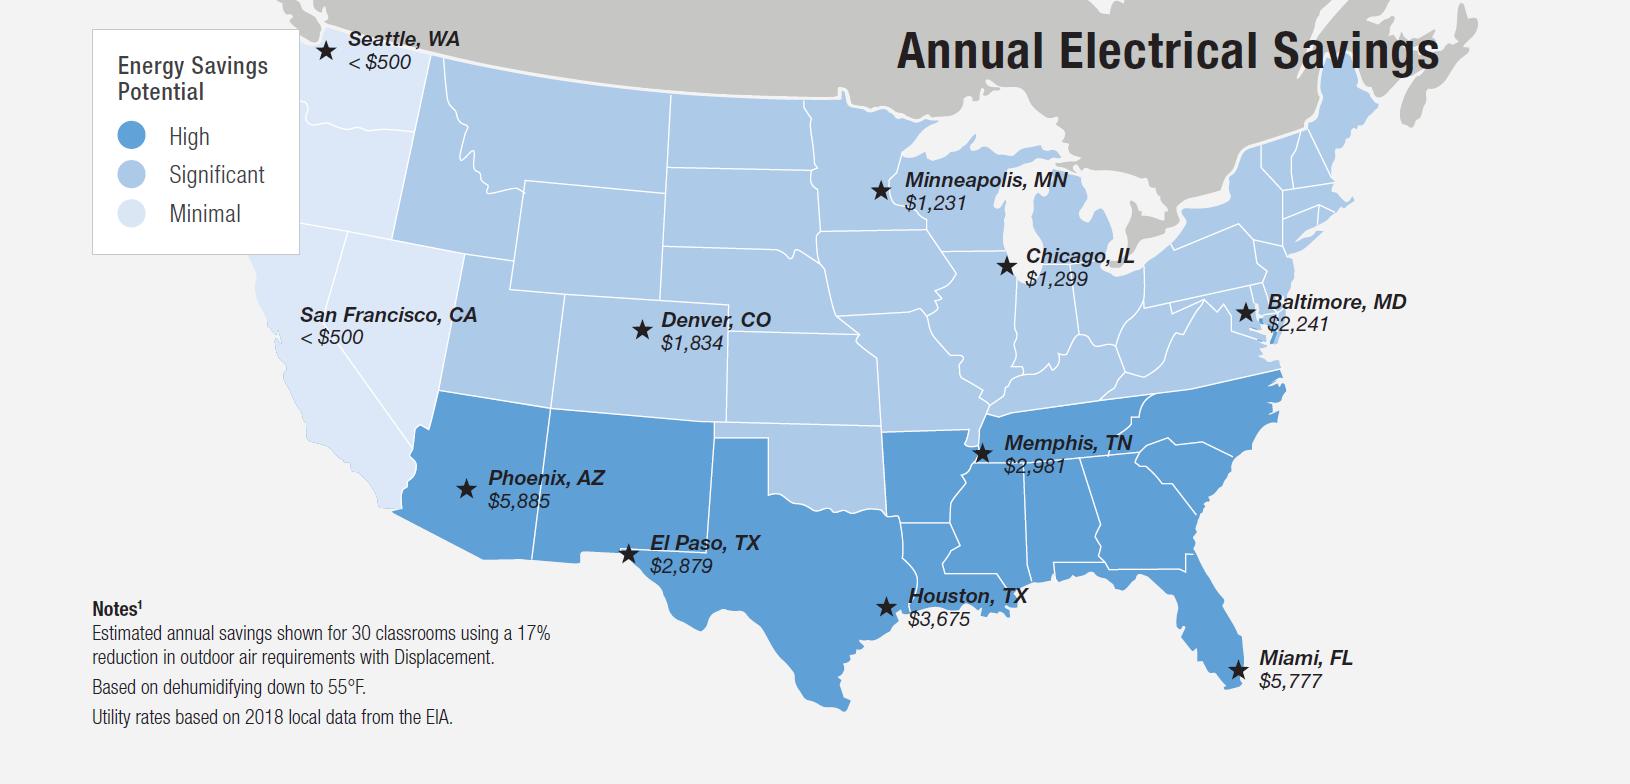 annual electrical savings